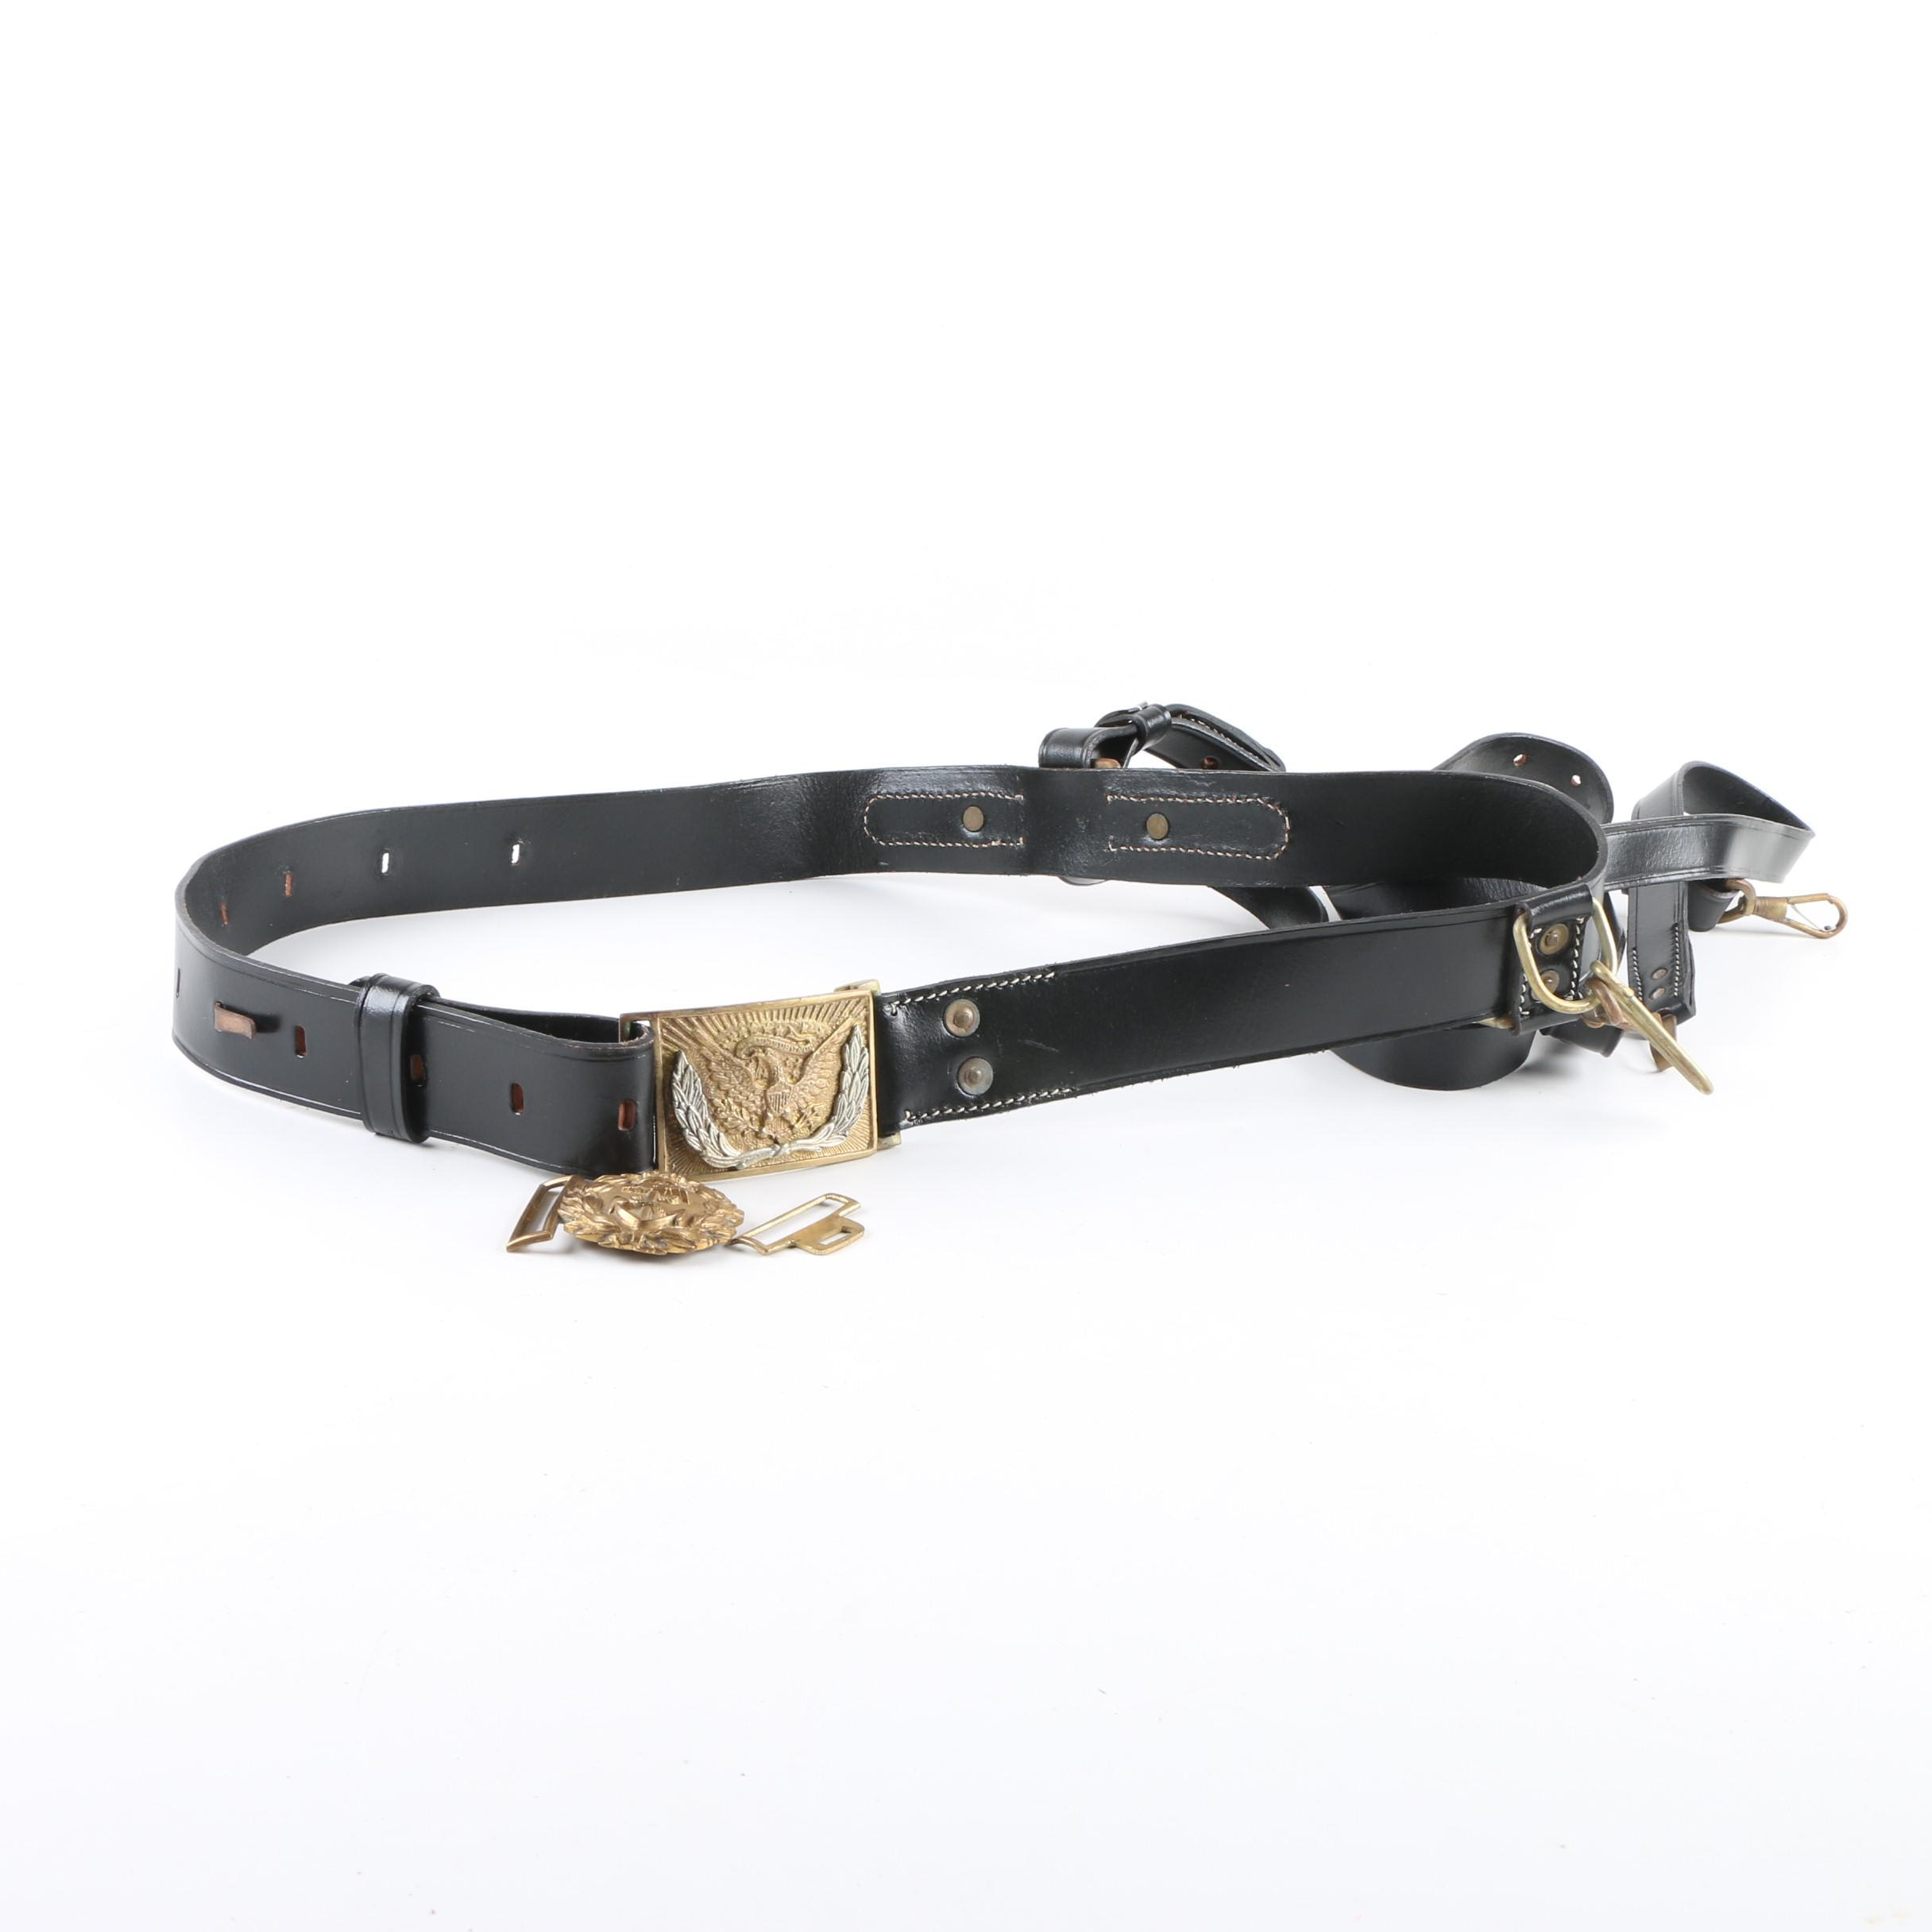 Vintage Military Belt and Holster